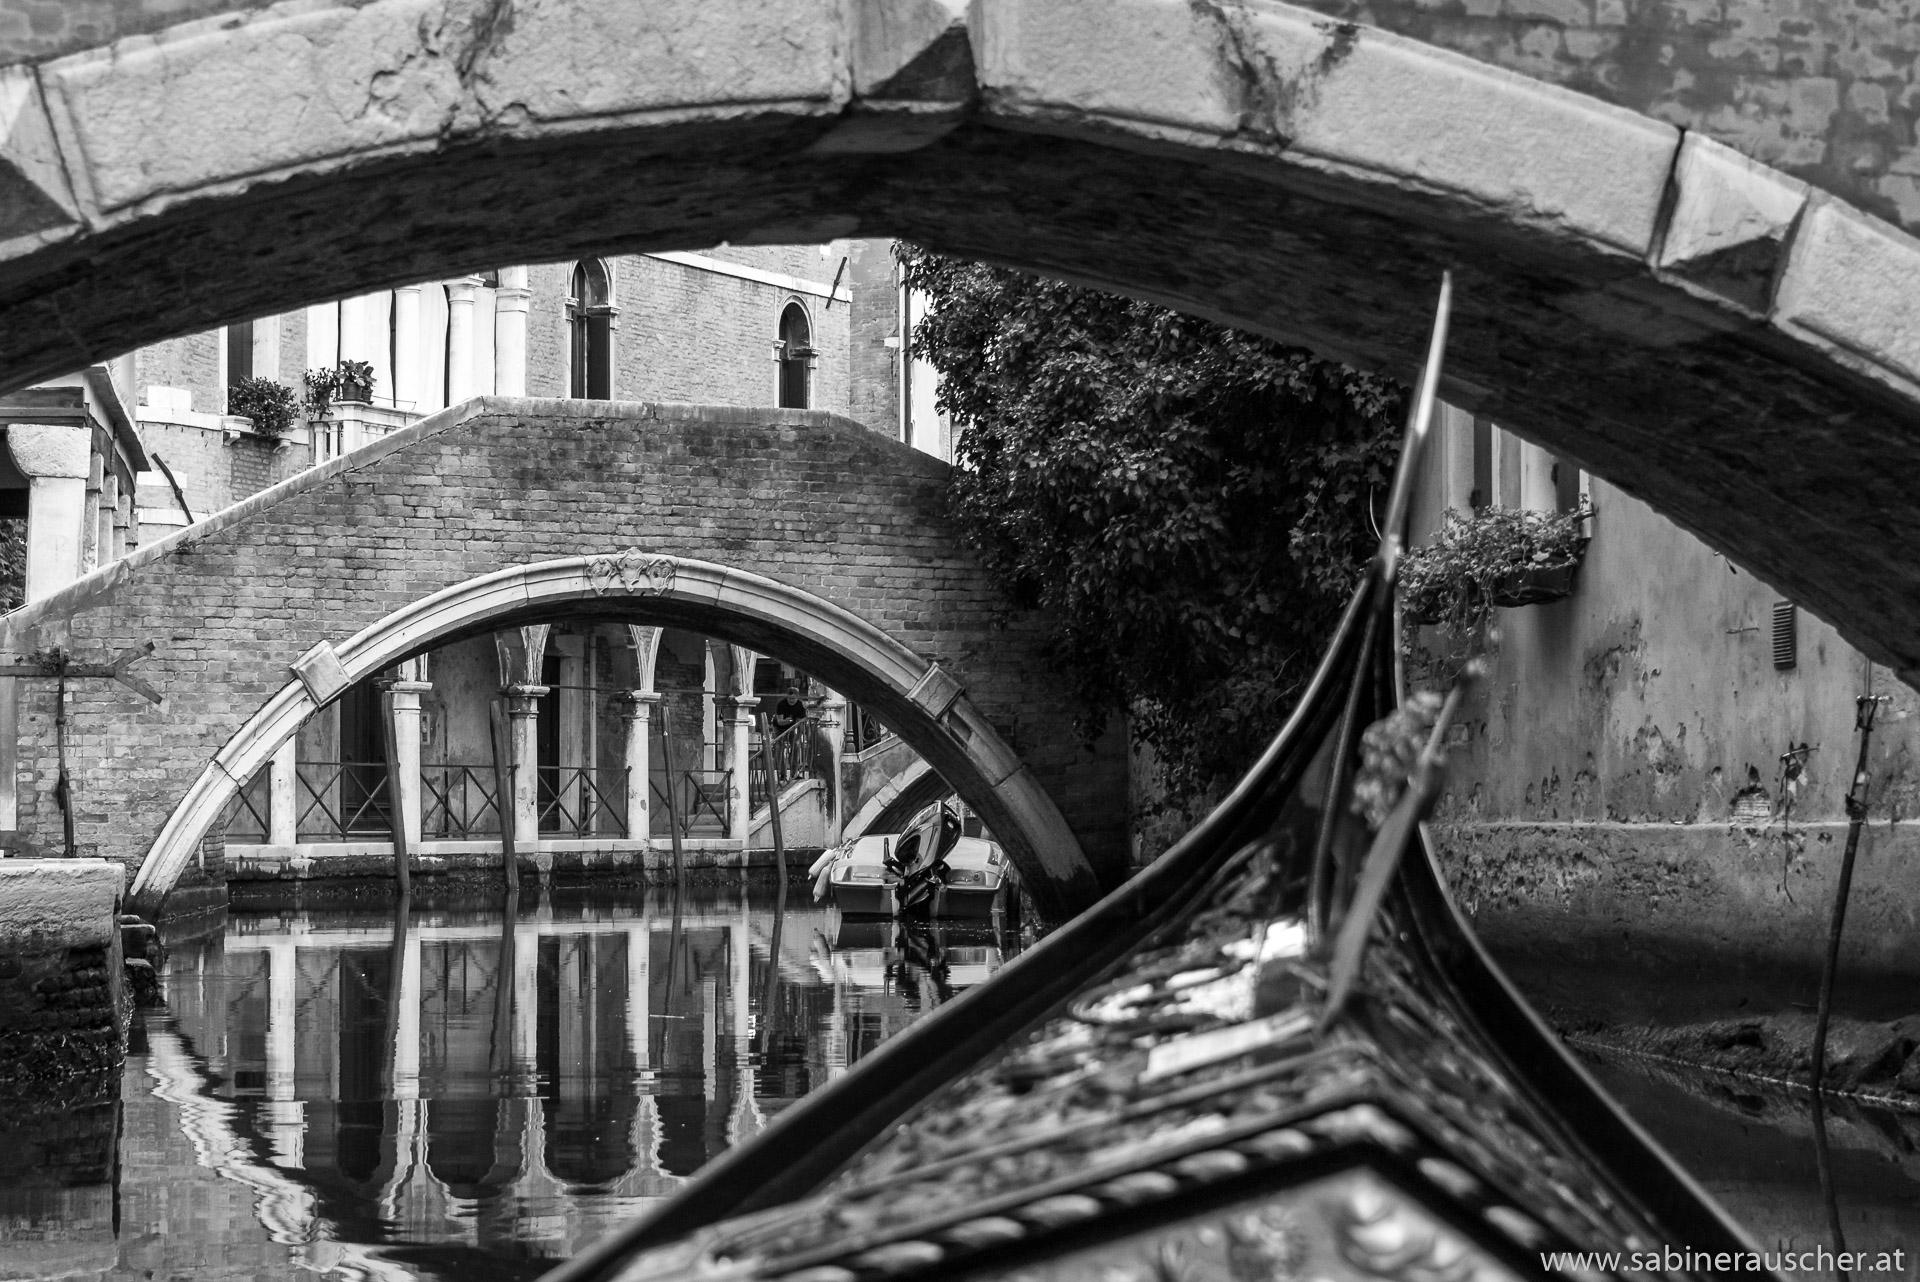 Venice - enjoy a ride with a gondola underneath the bridges | Venedig - unter dem Brücken in den Kanälen